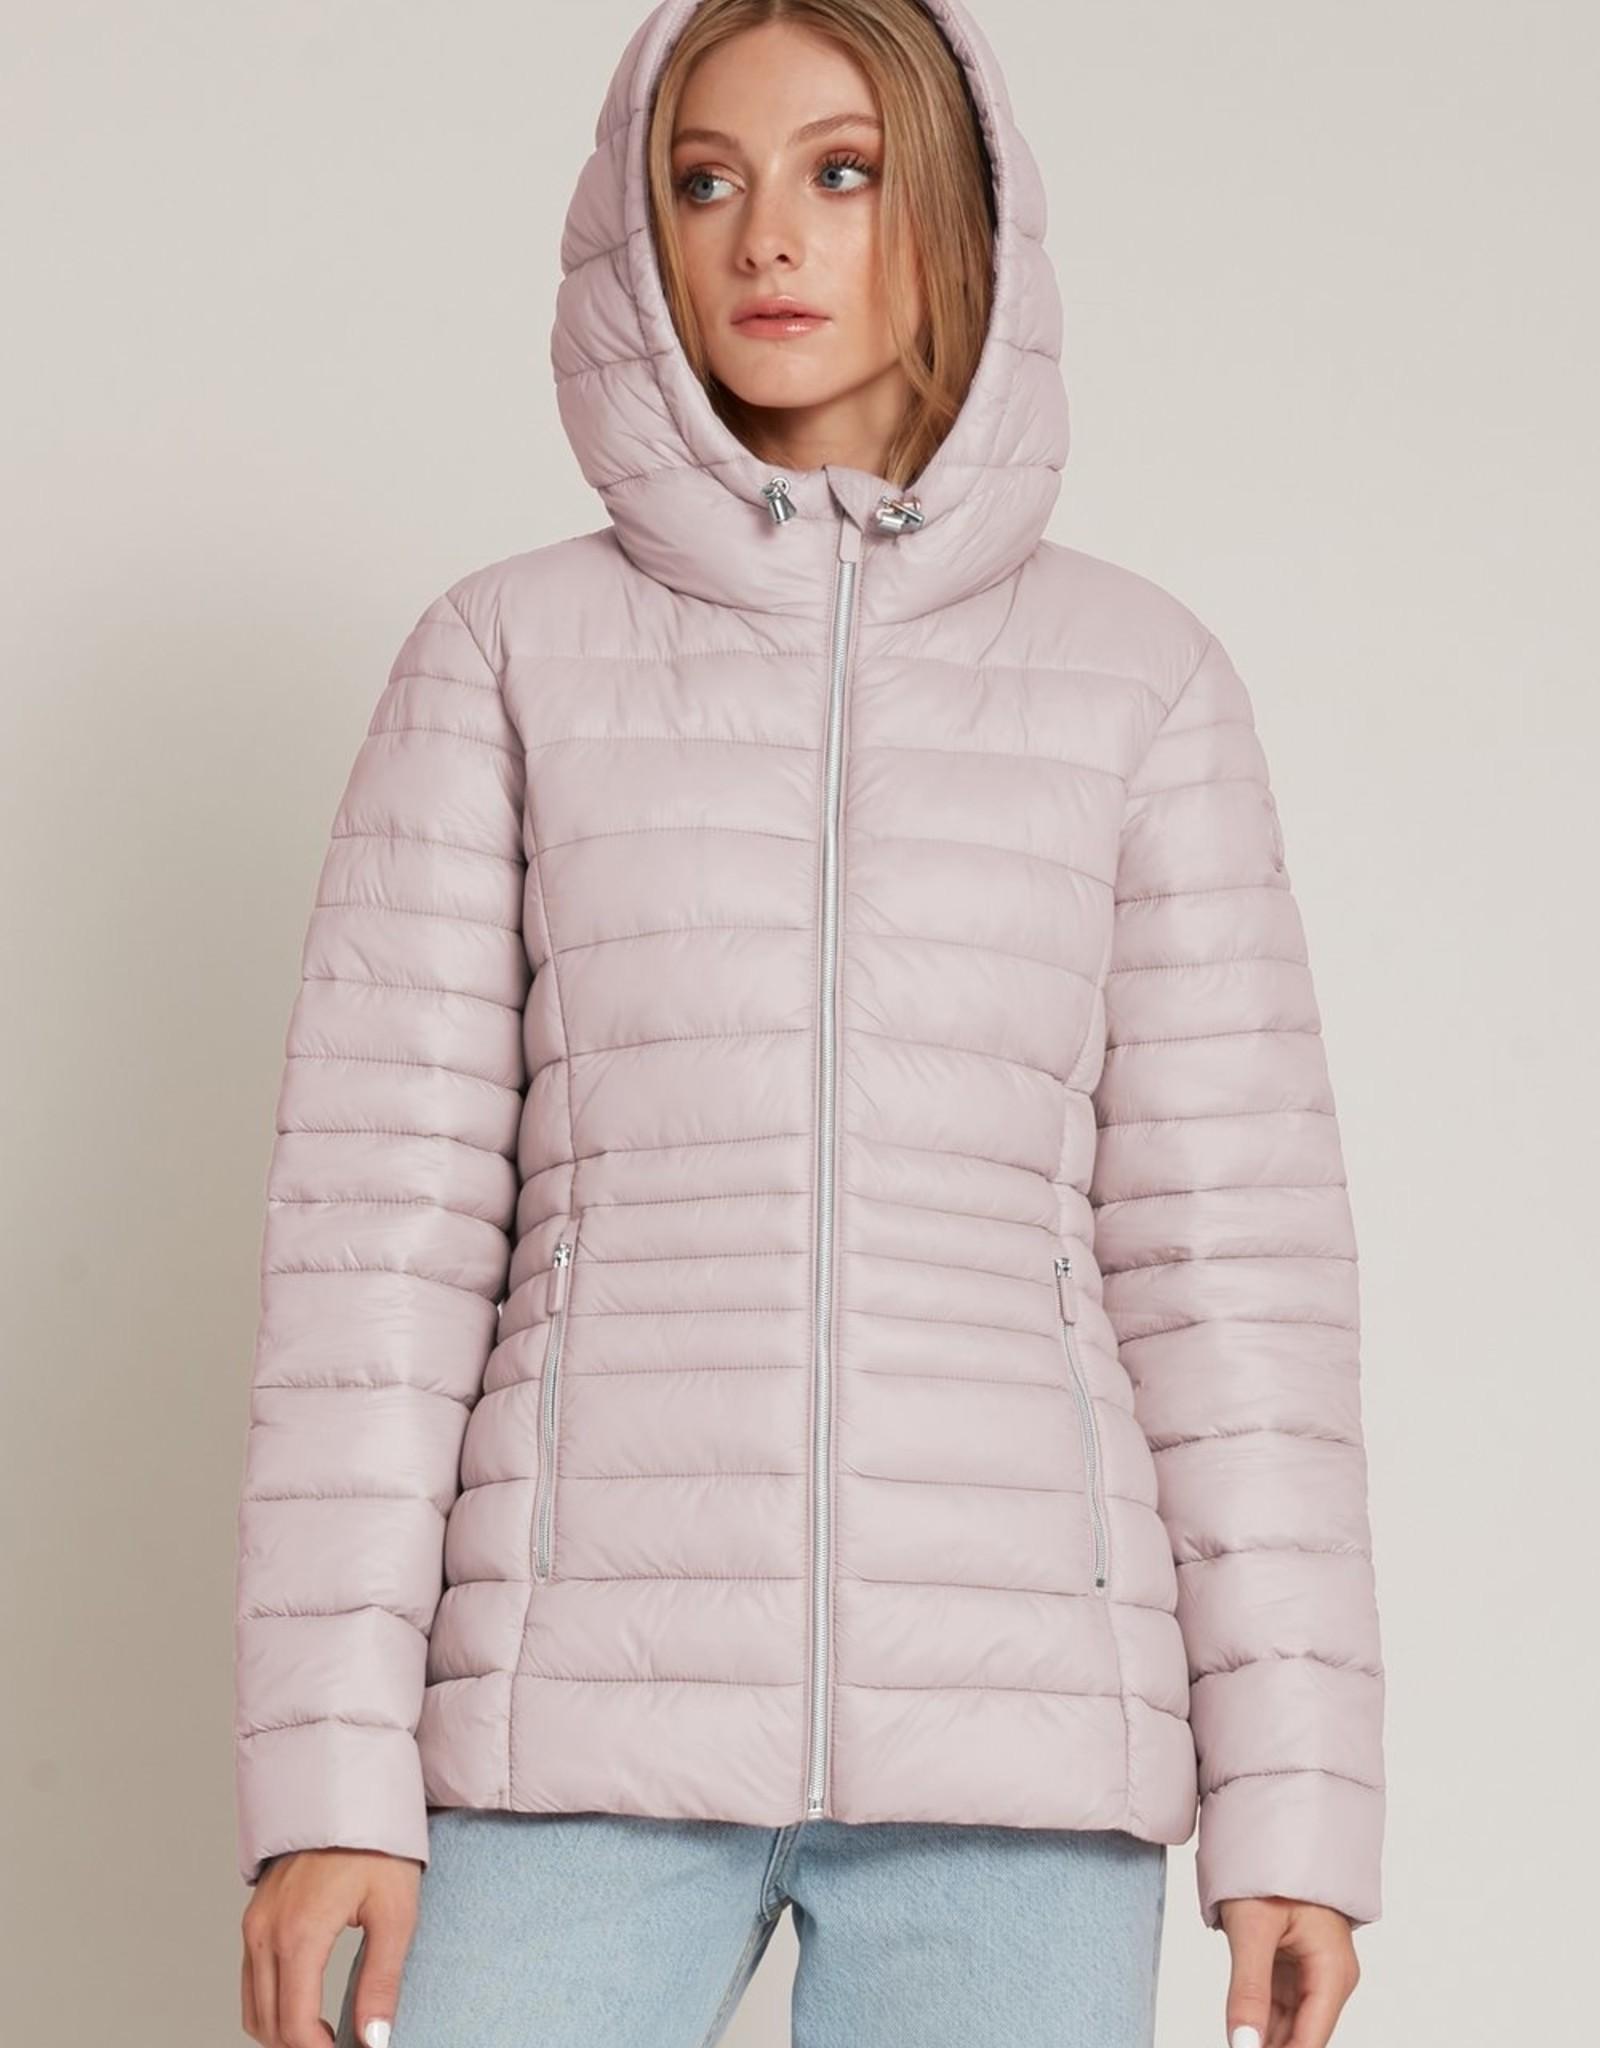 Point Zero Point Zero 8758302 Short Ultralight weight Puffer Jacket up to -5 C Weather